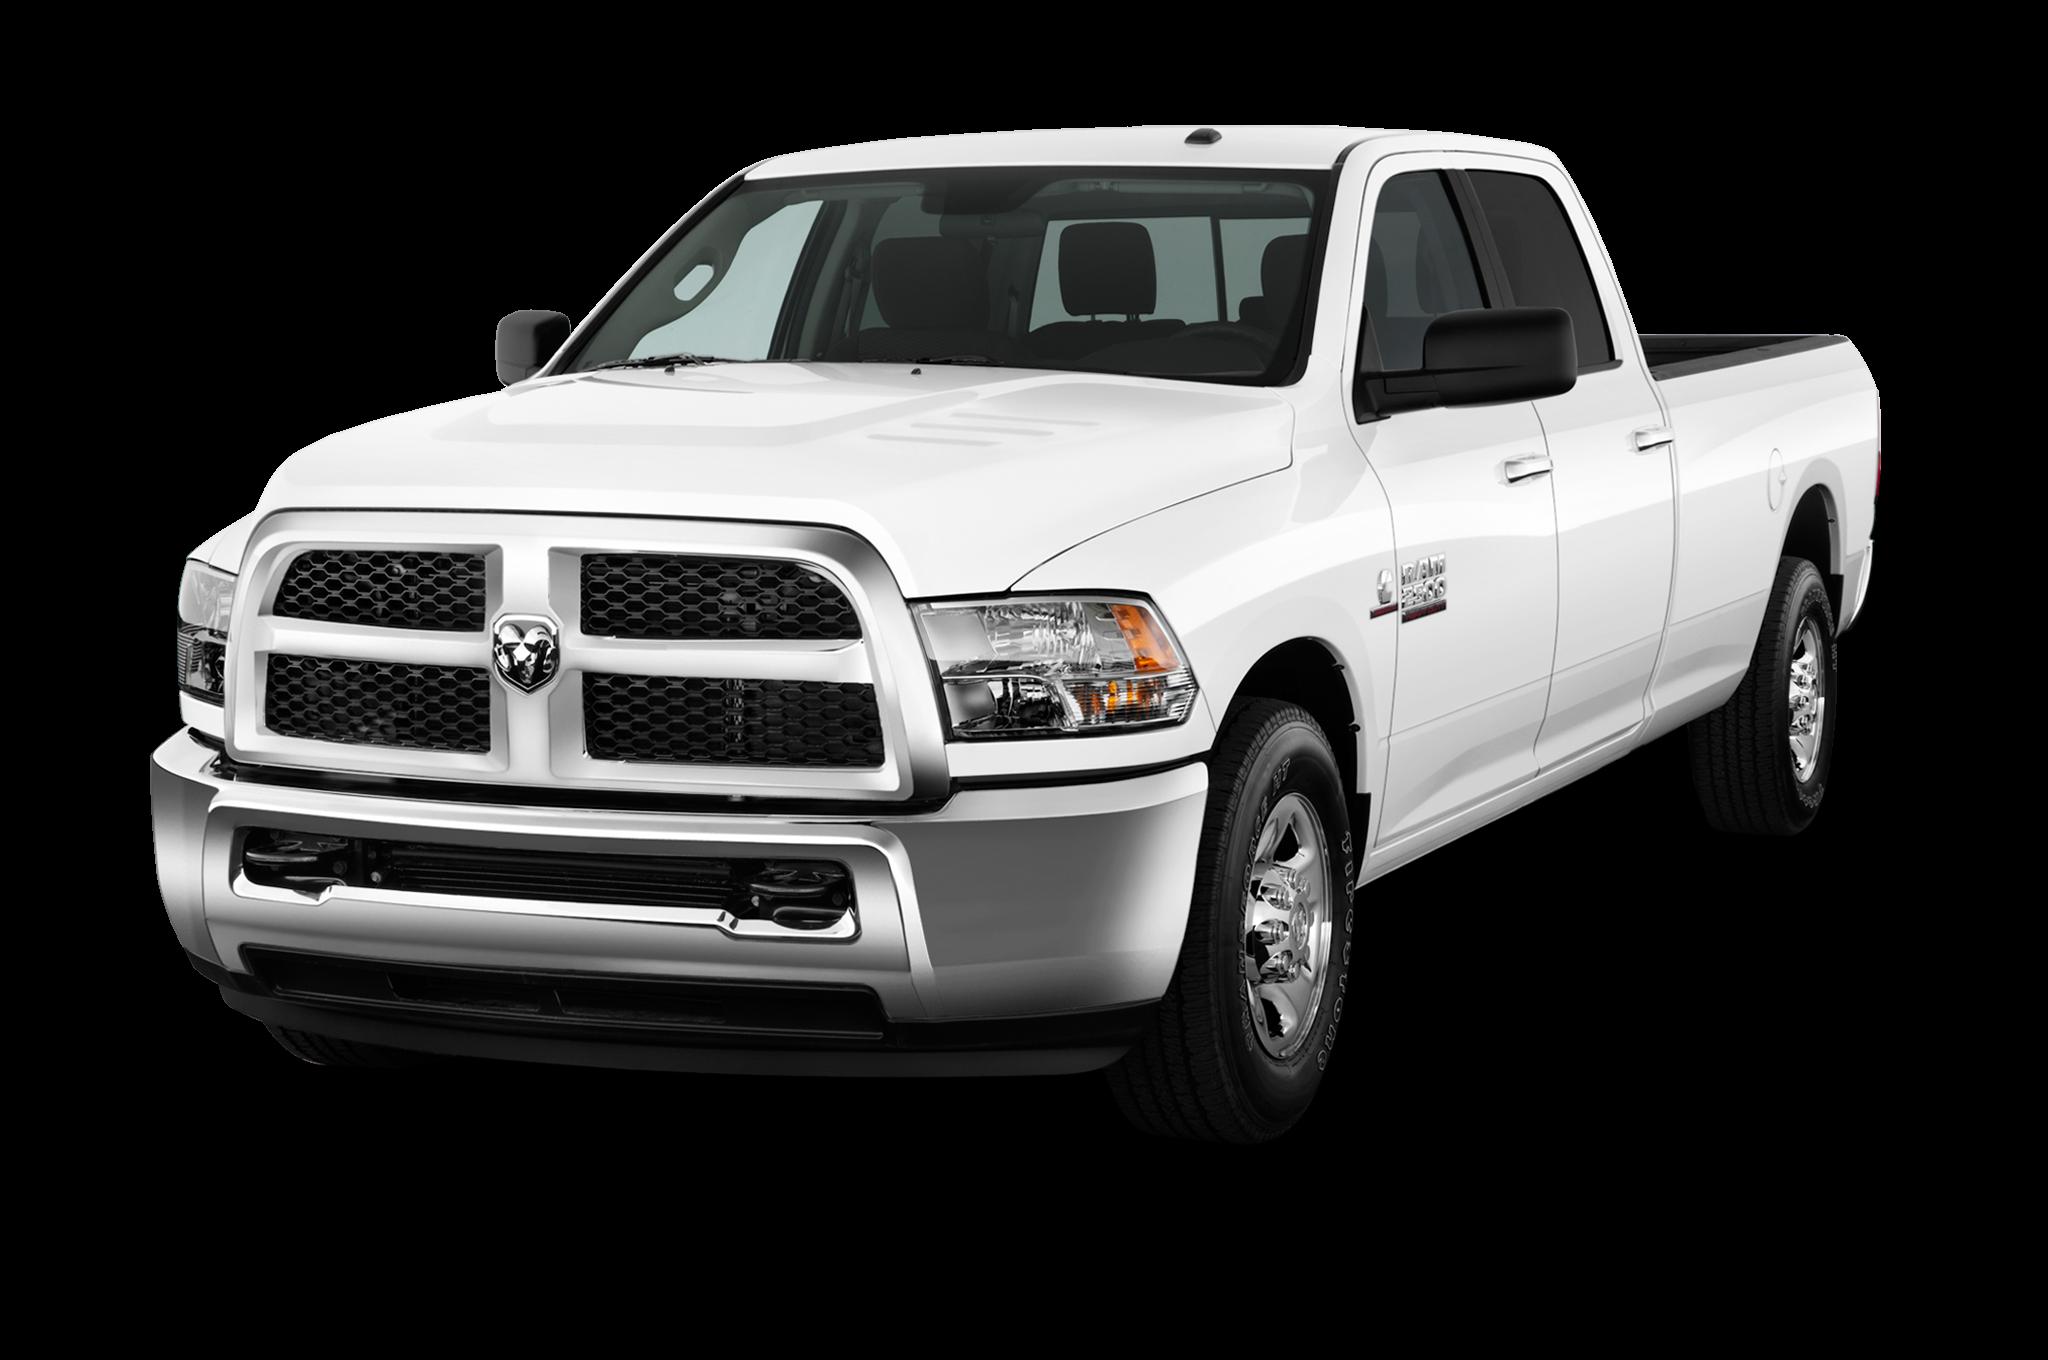 2017 Ram 2500 Regular Cab >> Dodge Ram 2500 Pickup Slt 4x4 Regular Cab 2017